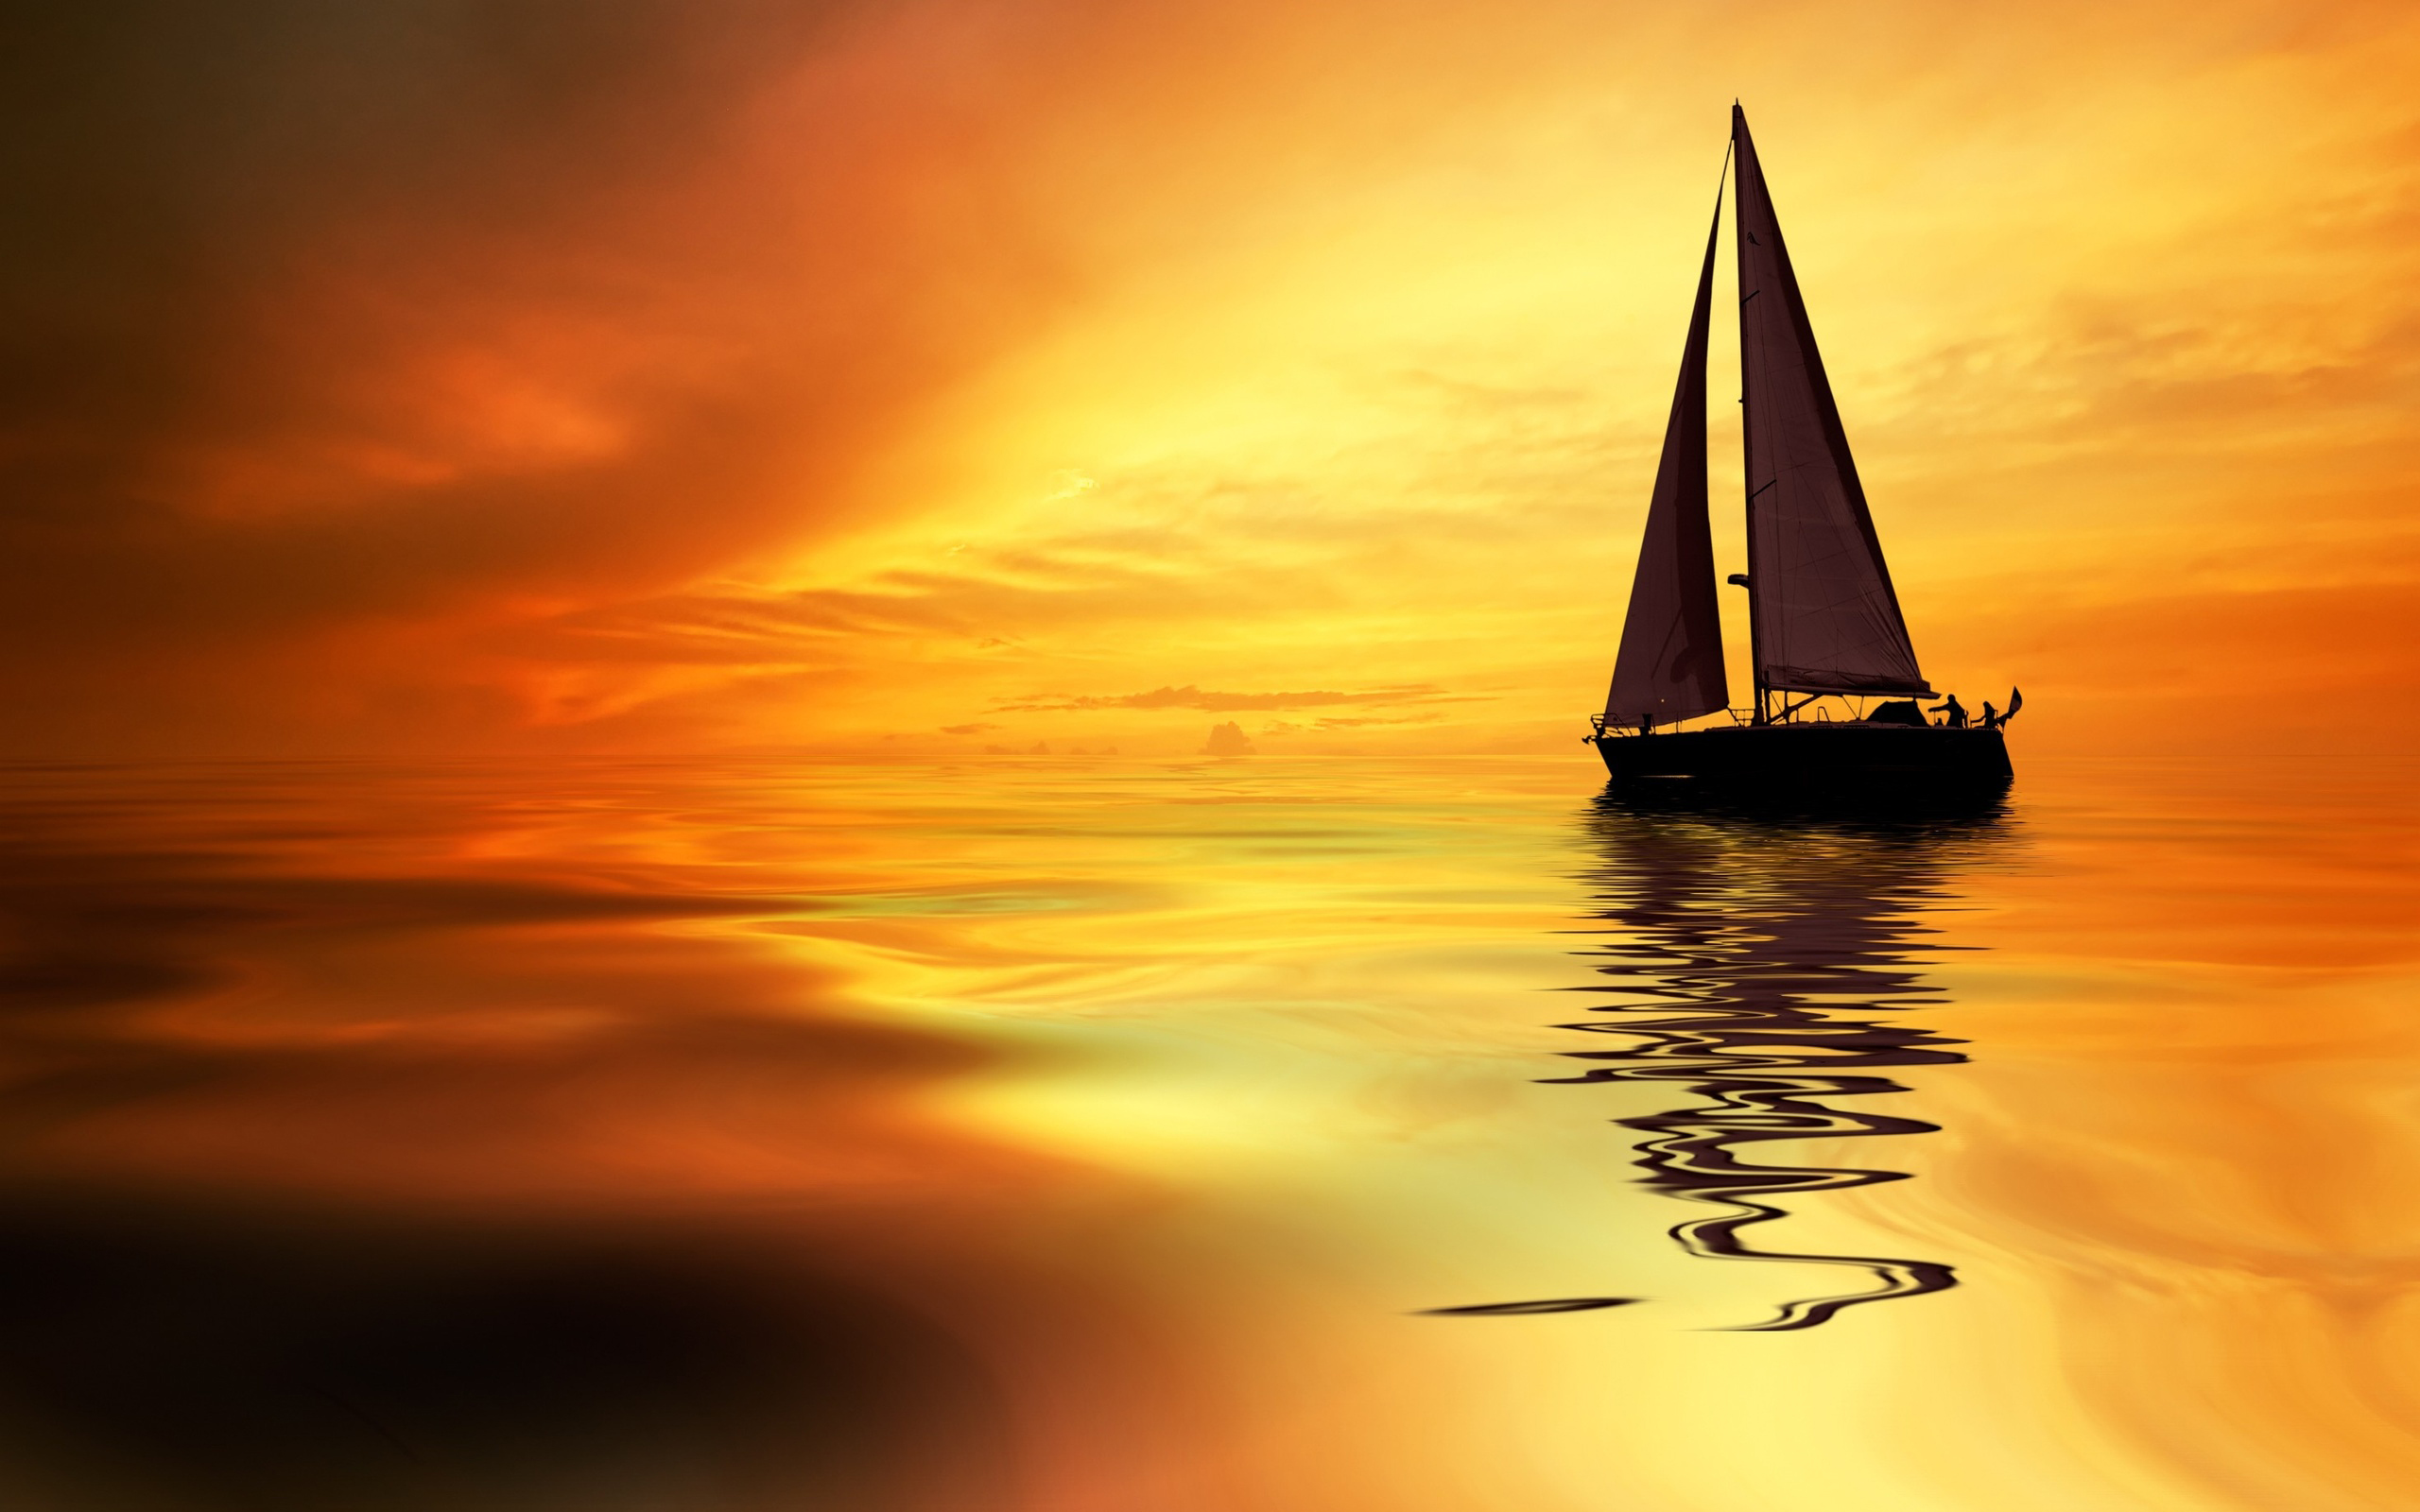 Картинки море яхты солнце